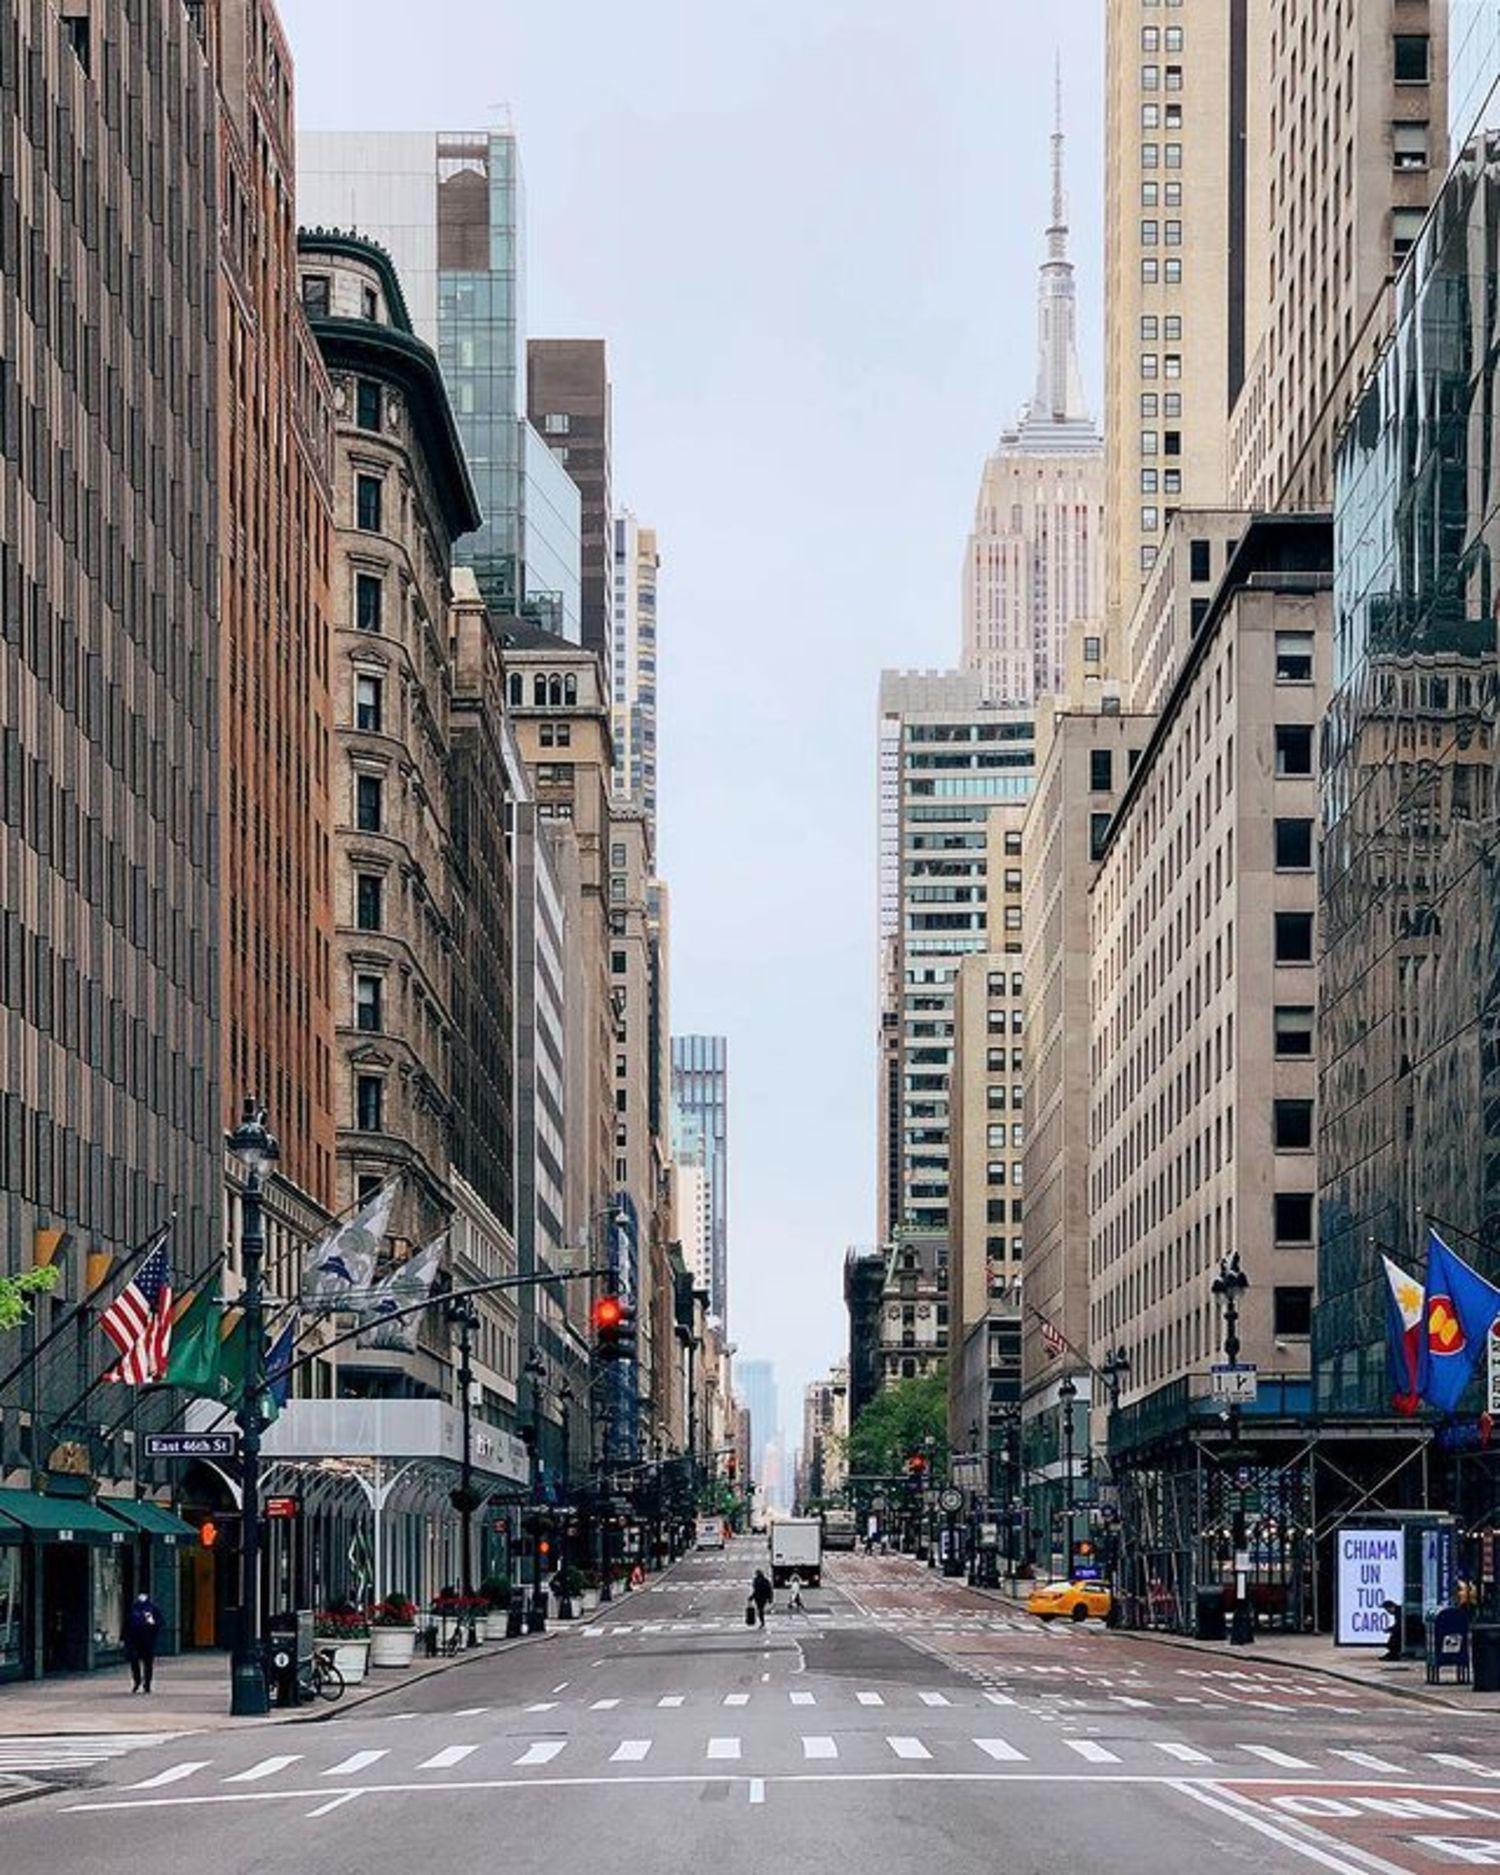 5th Avenue and 46th Street, Midtown, Manhattan